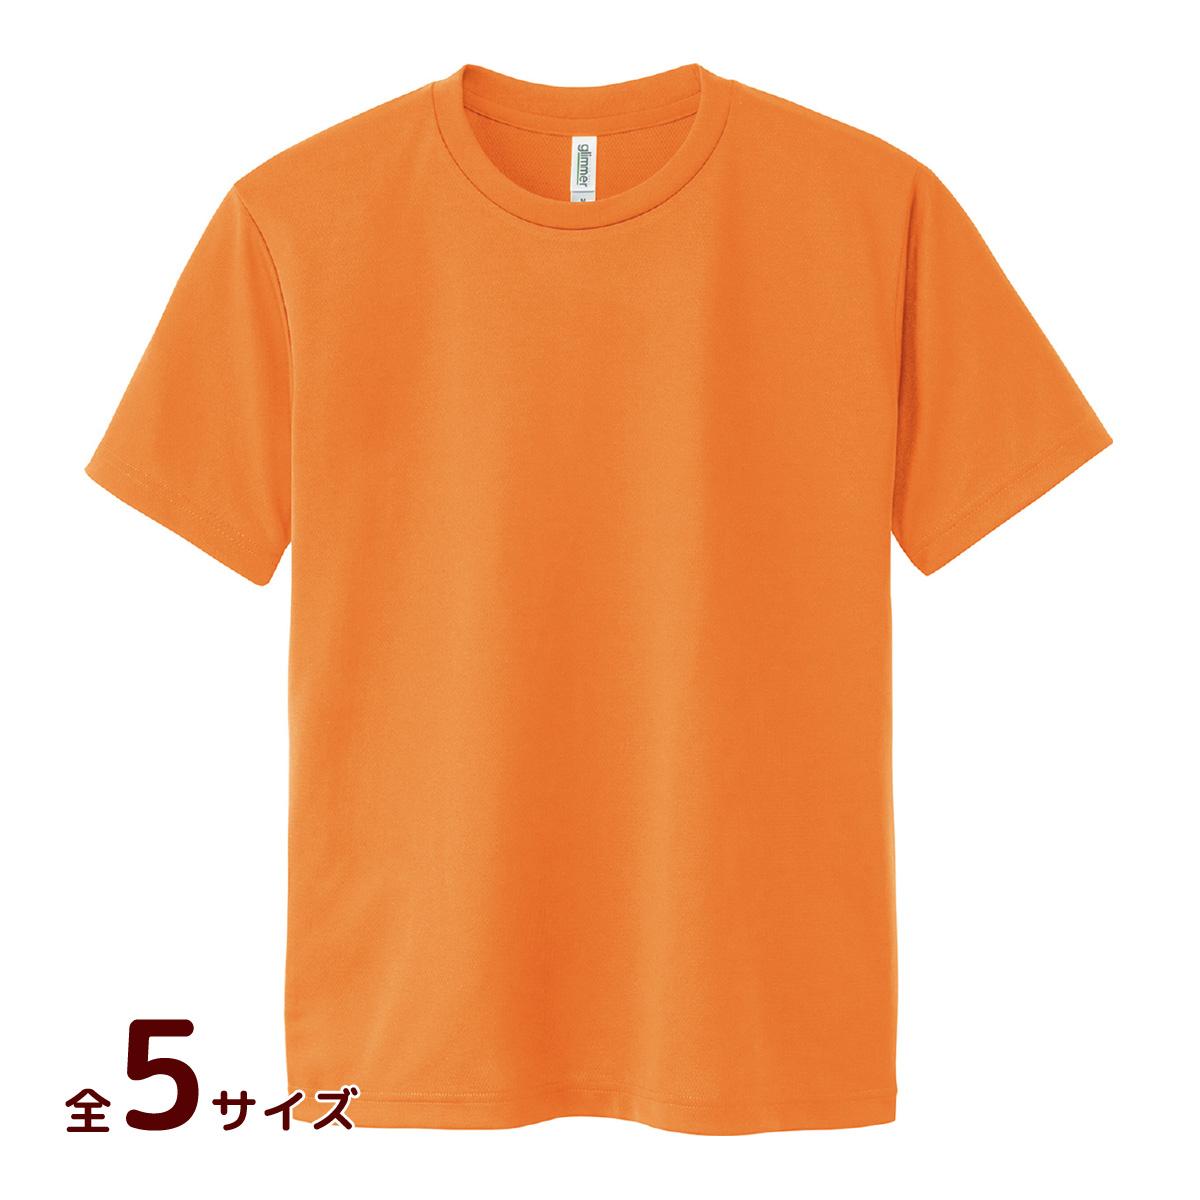 DXドライTシャツ オレンジ Tシャツ メンズ 速乾 半袖 レディース キッズ 子供 無地